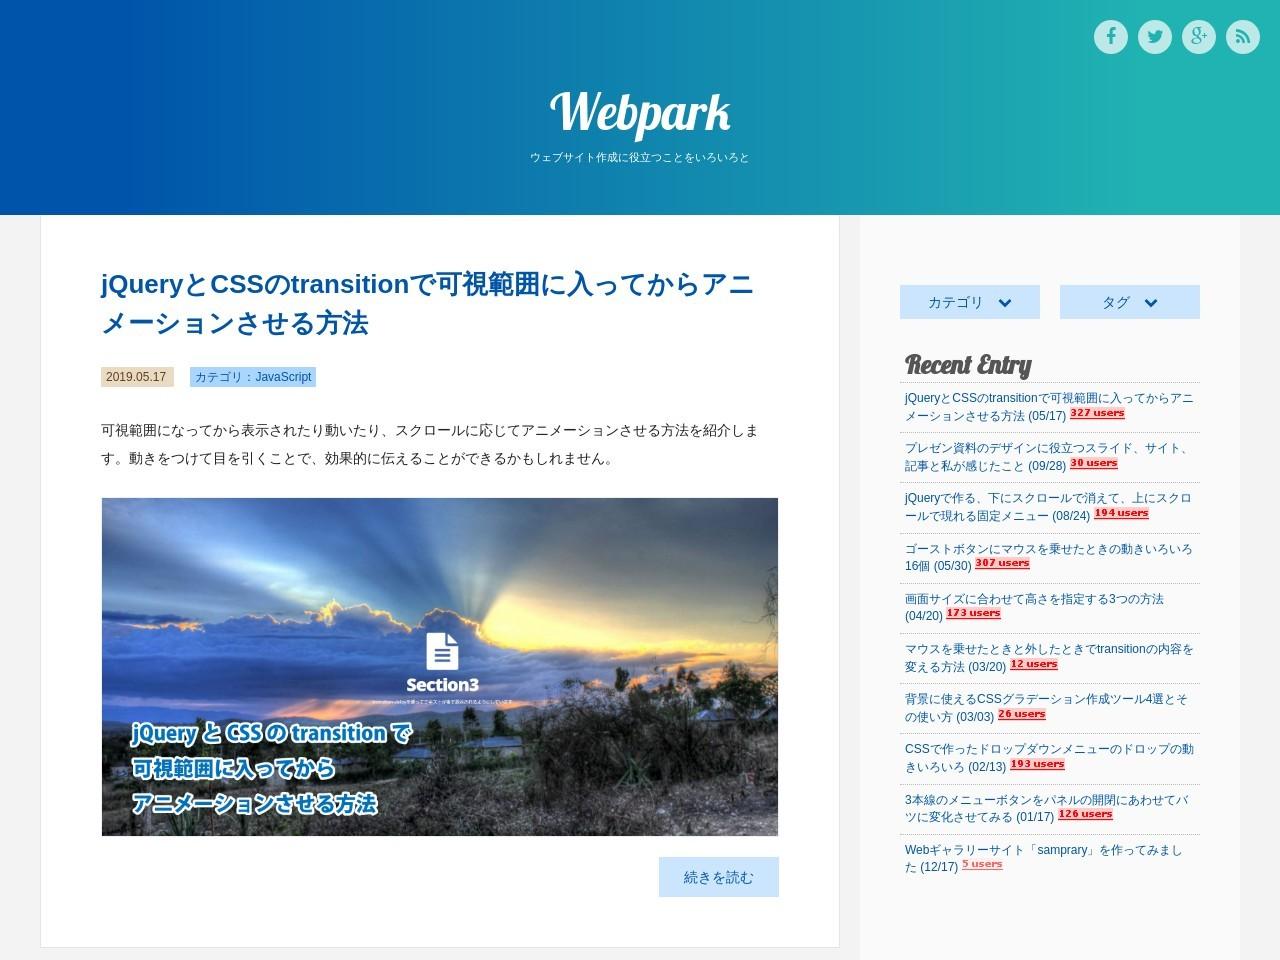 http://weboook.blog22.fc2.com/blog-entry-275.html